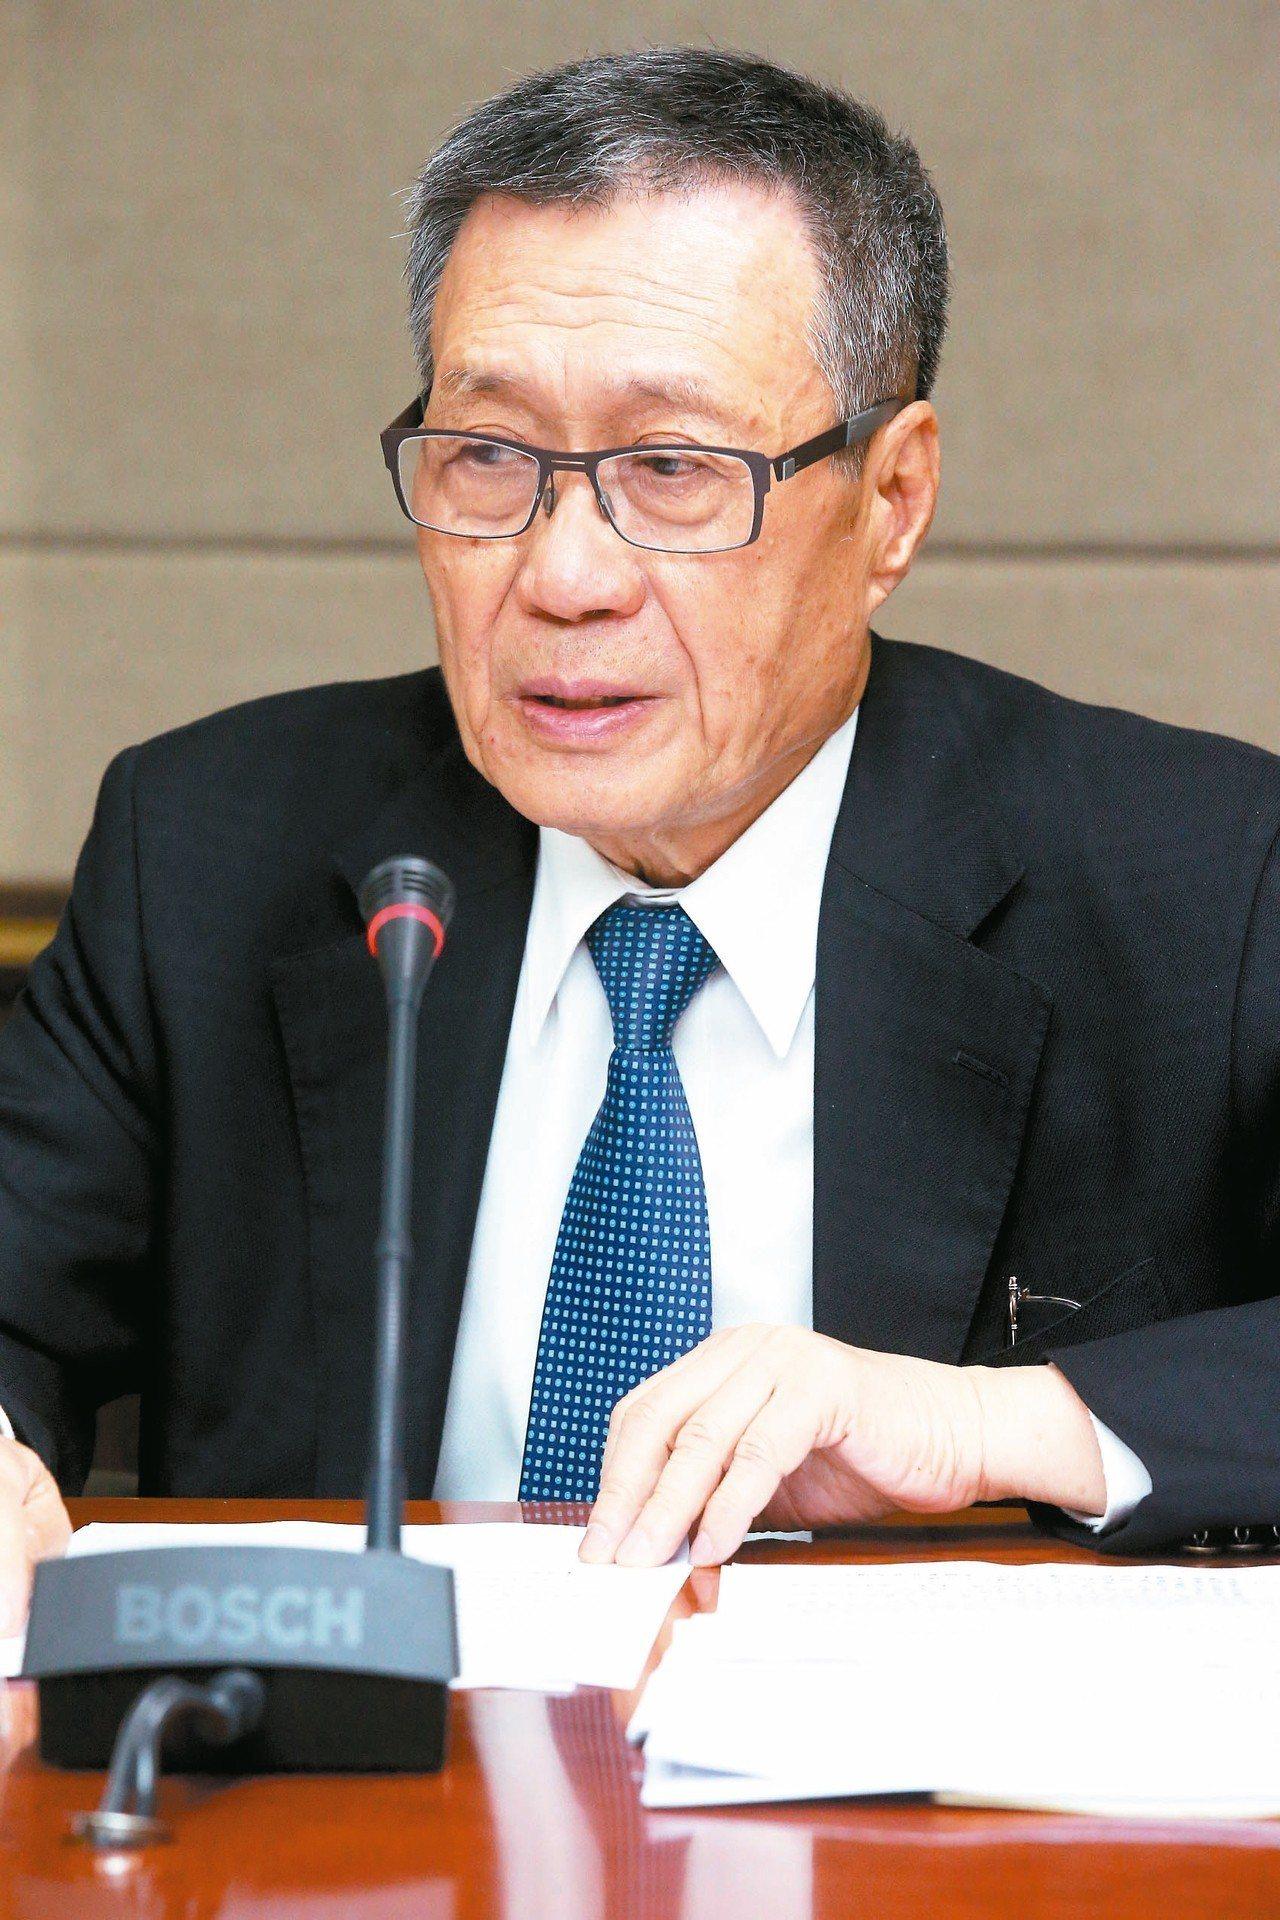 南電董事長吳嘉昭。 報系資料照